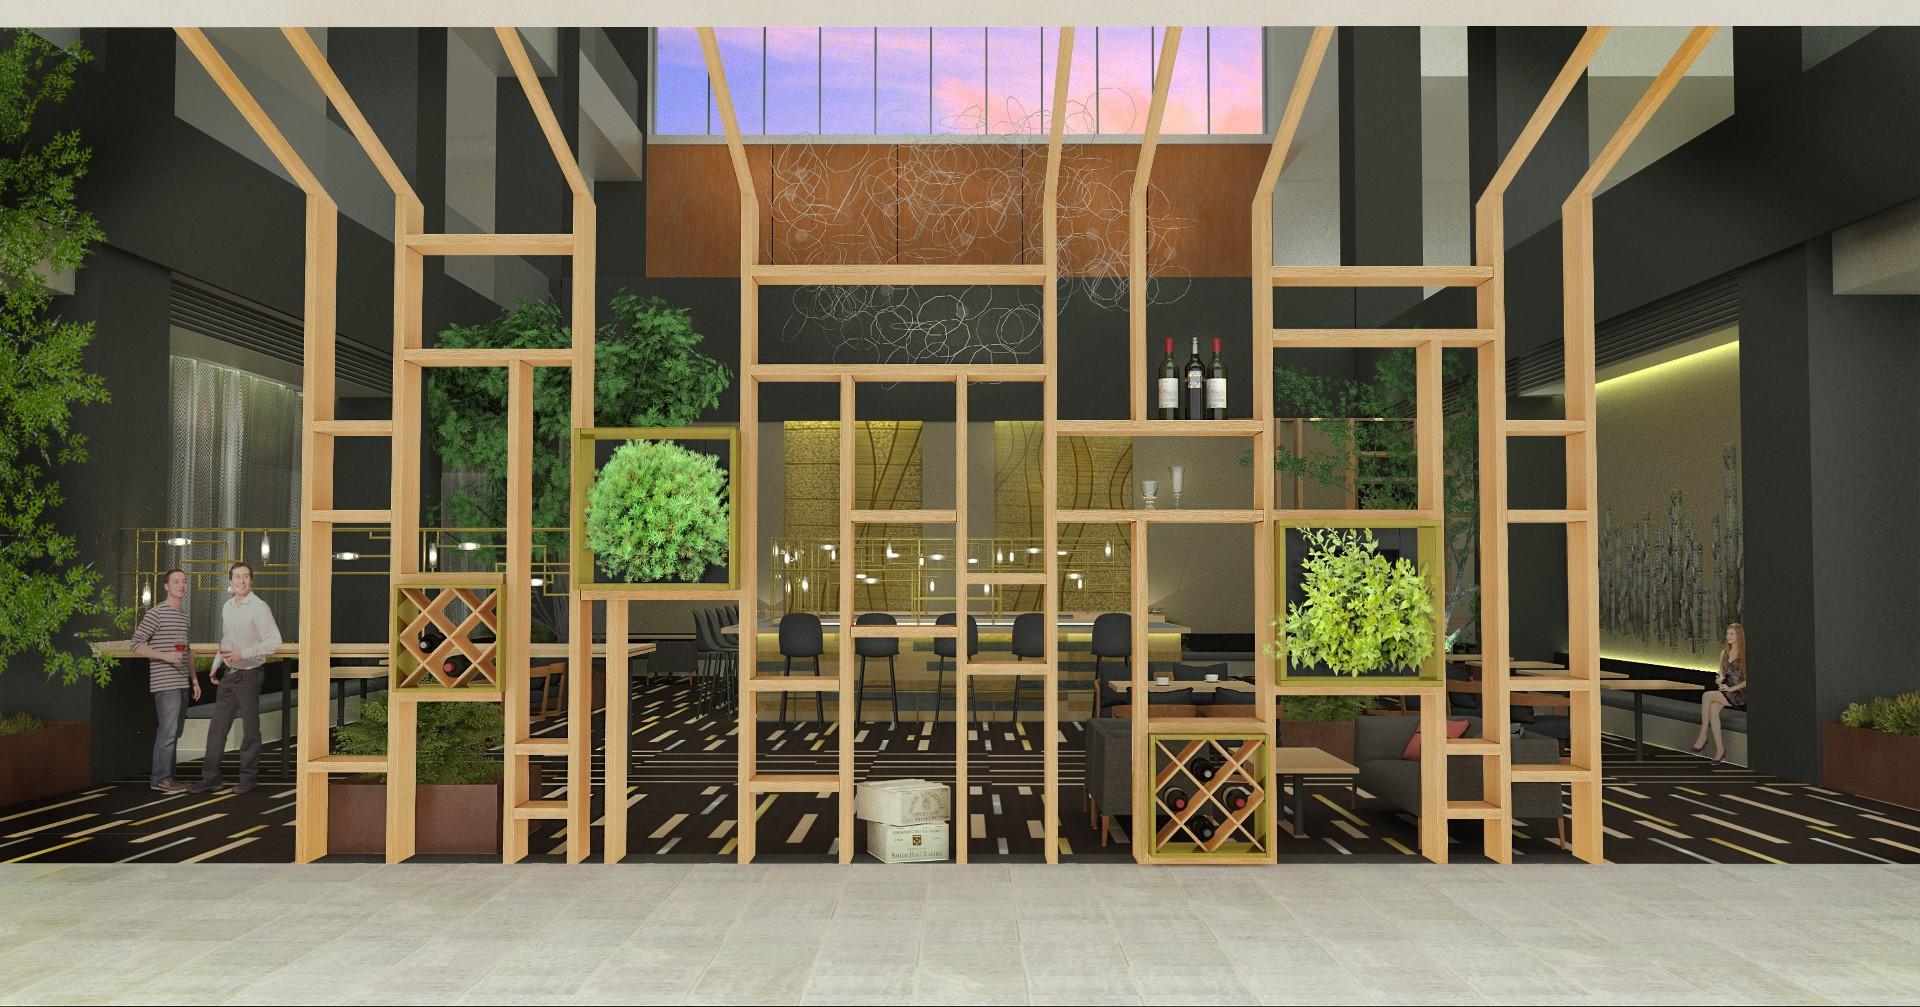 CafeBar scene1.jpg